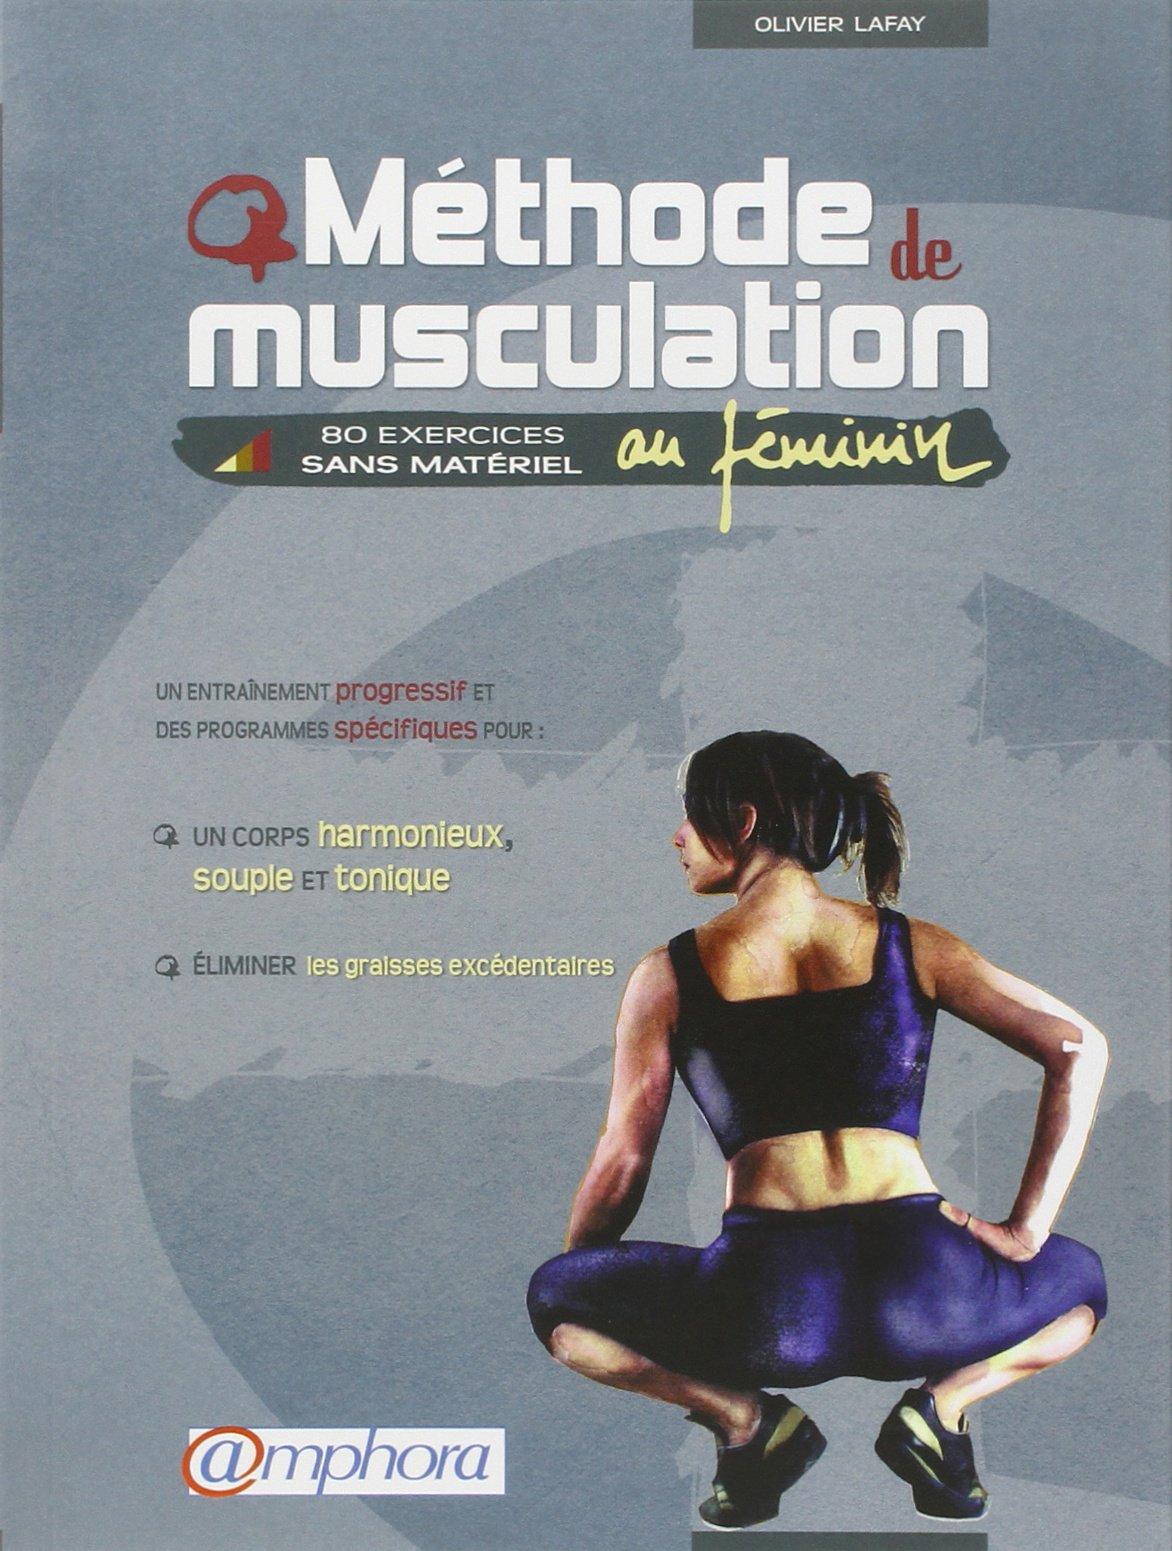 methode lafay au feminin en format